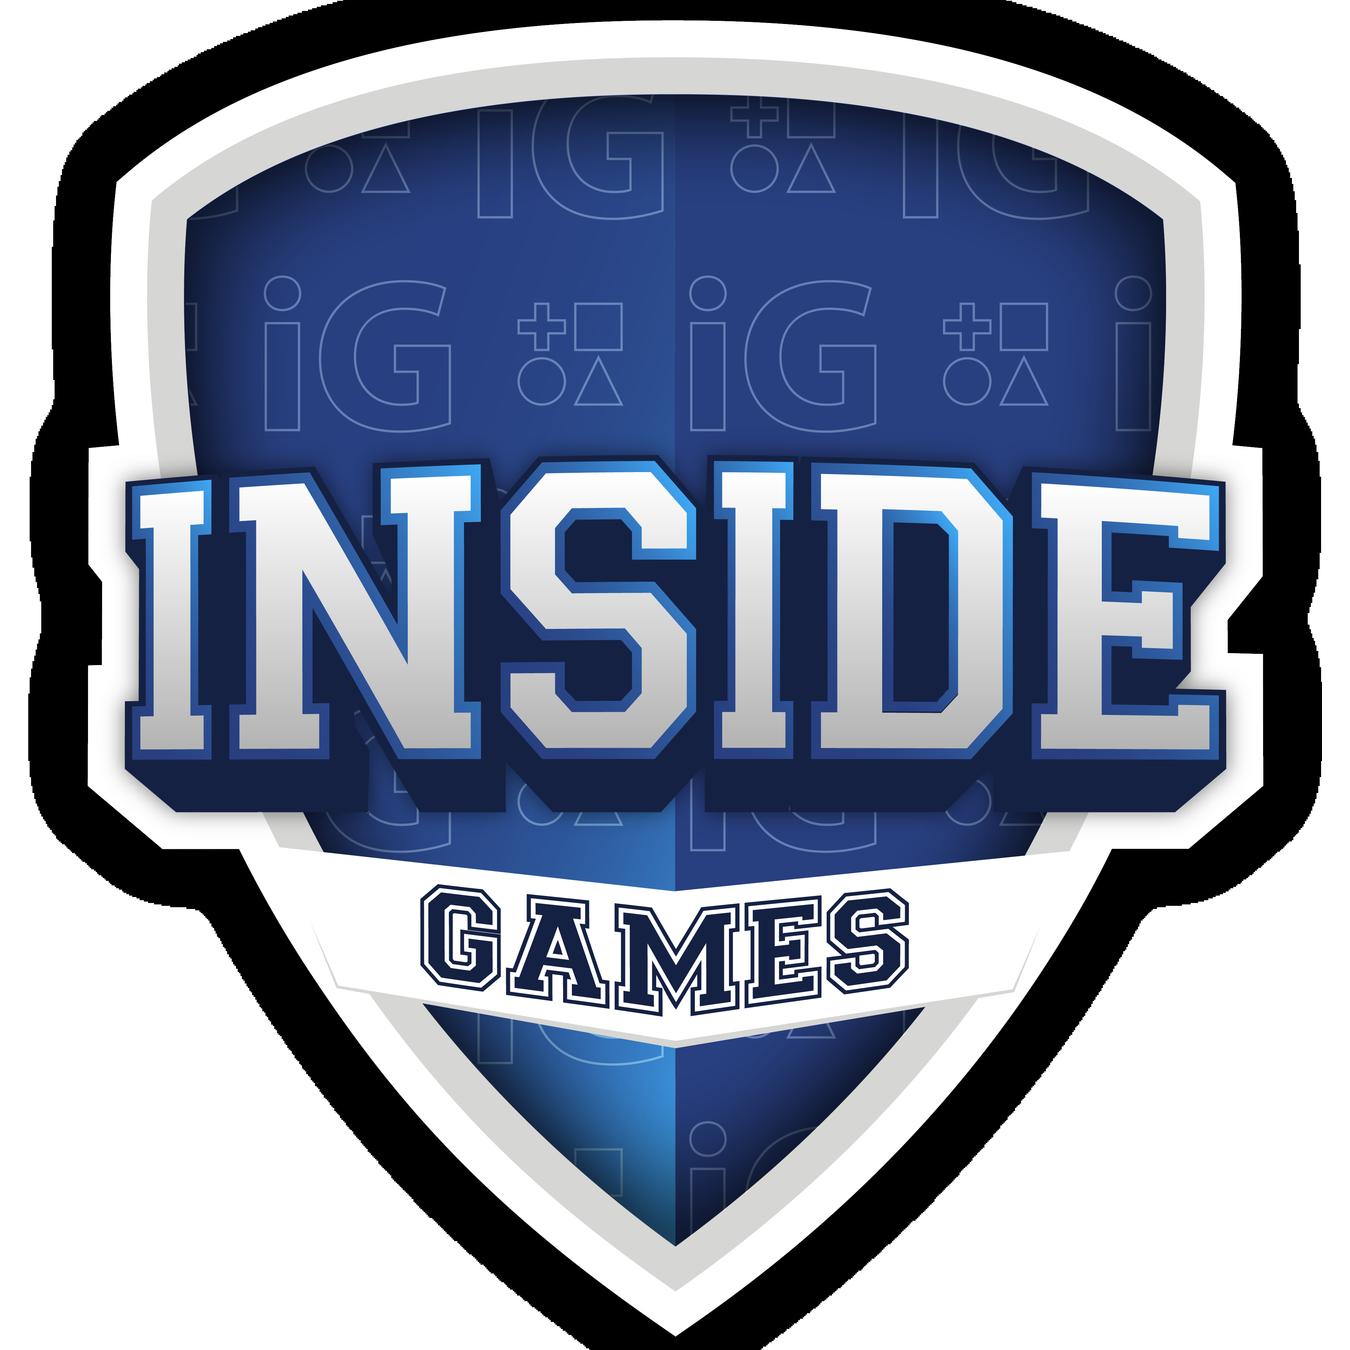 Inside Games Academy